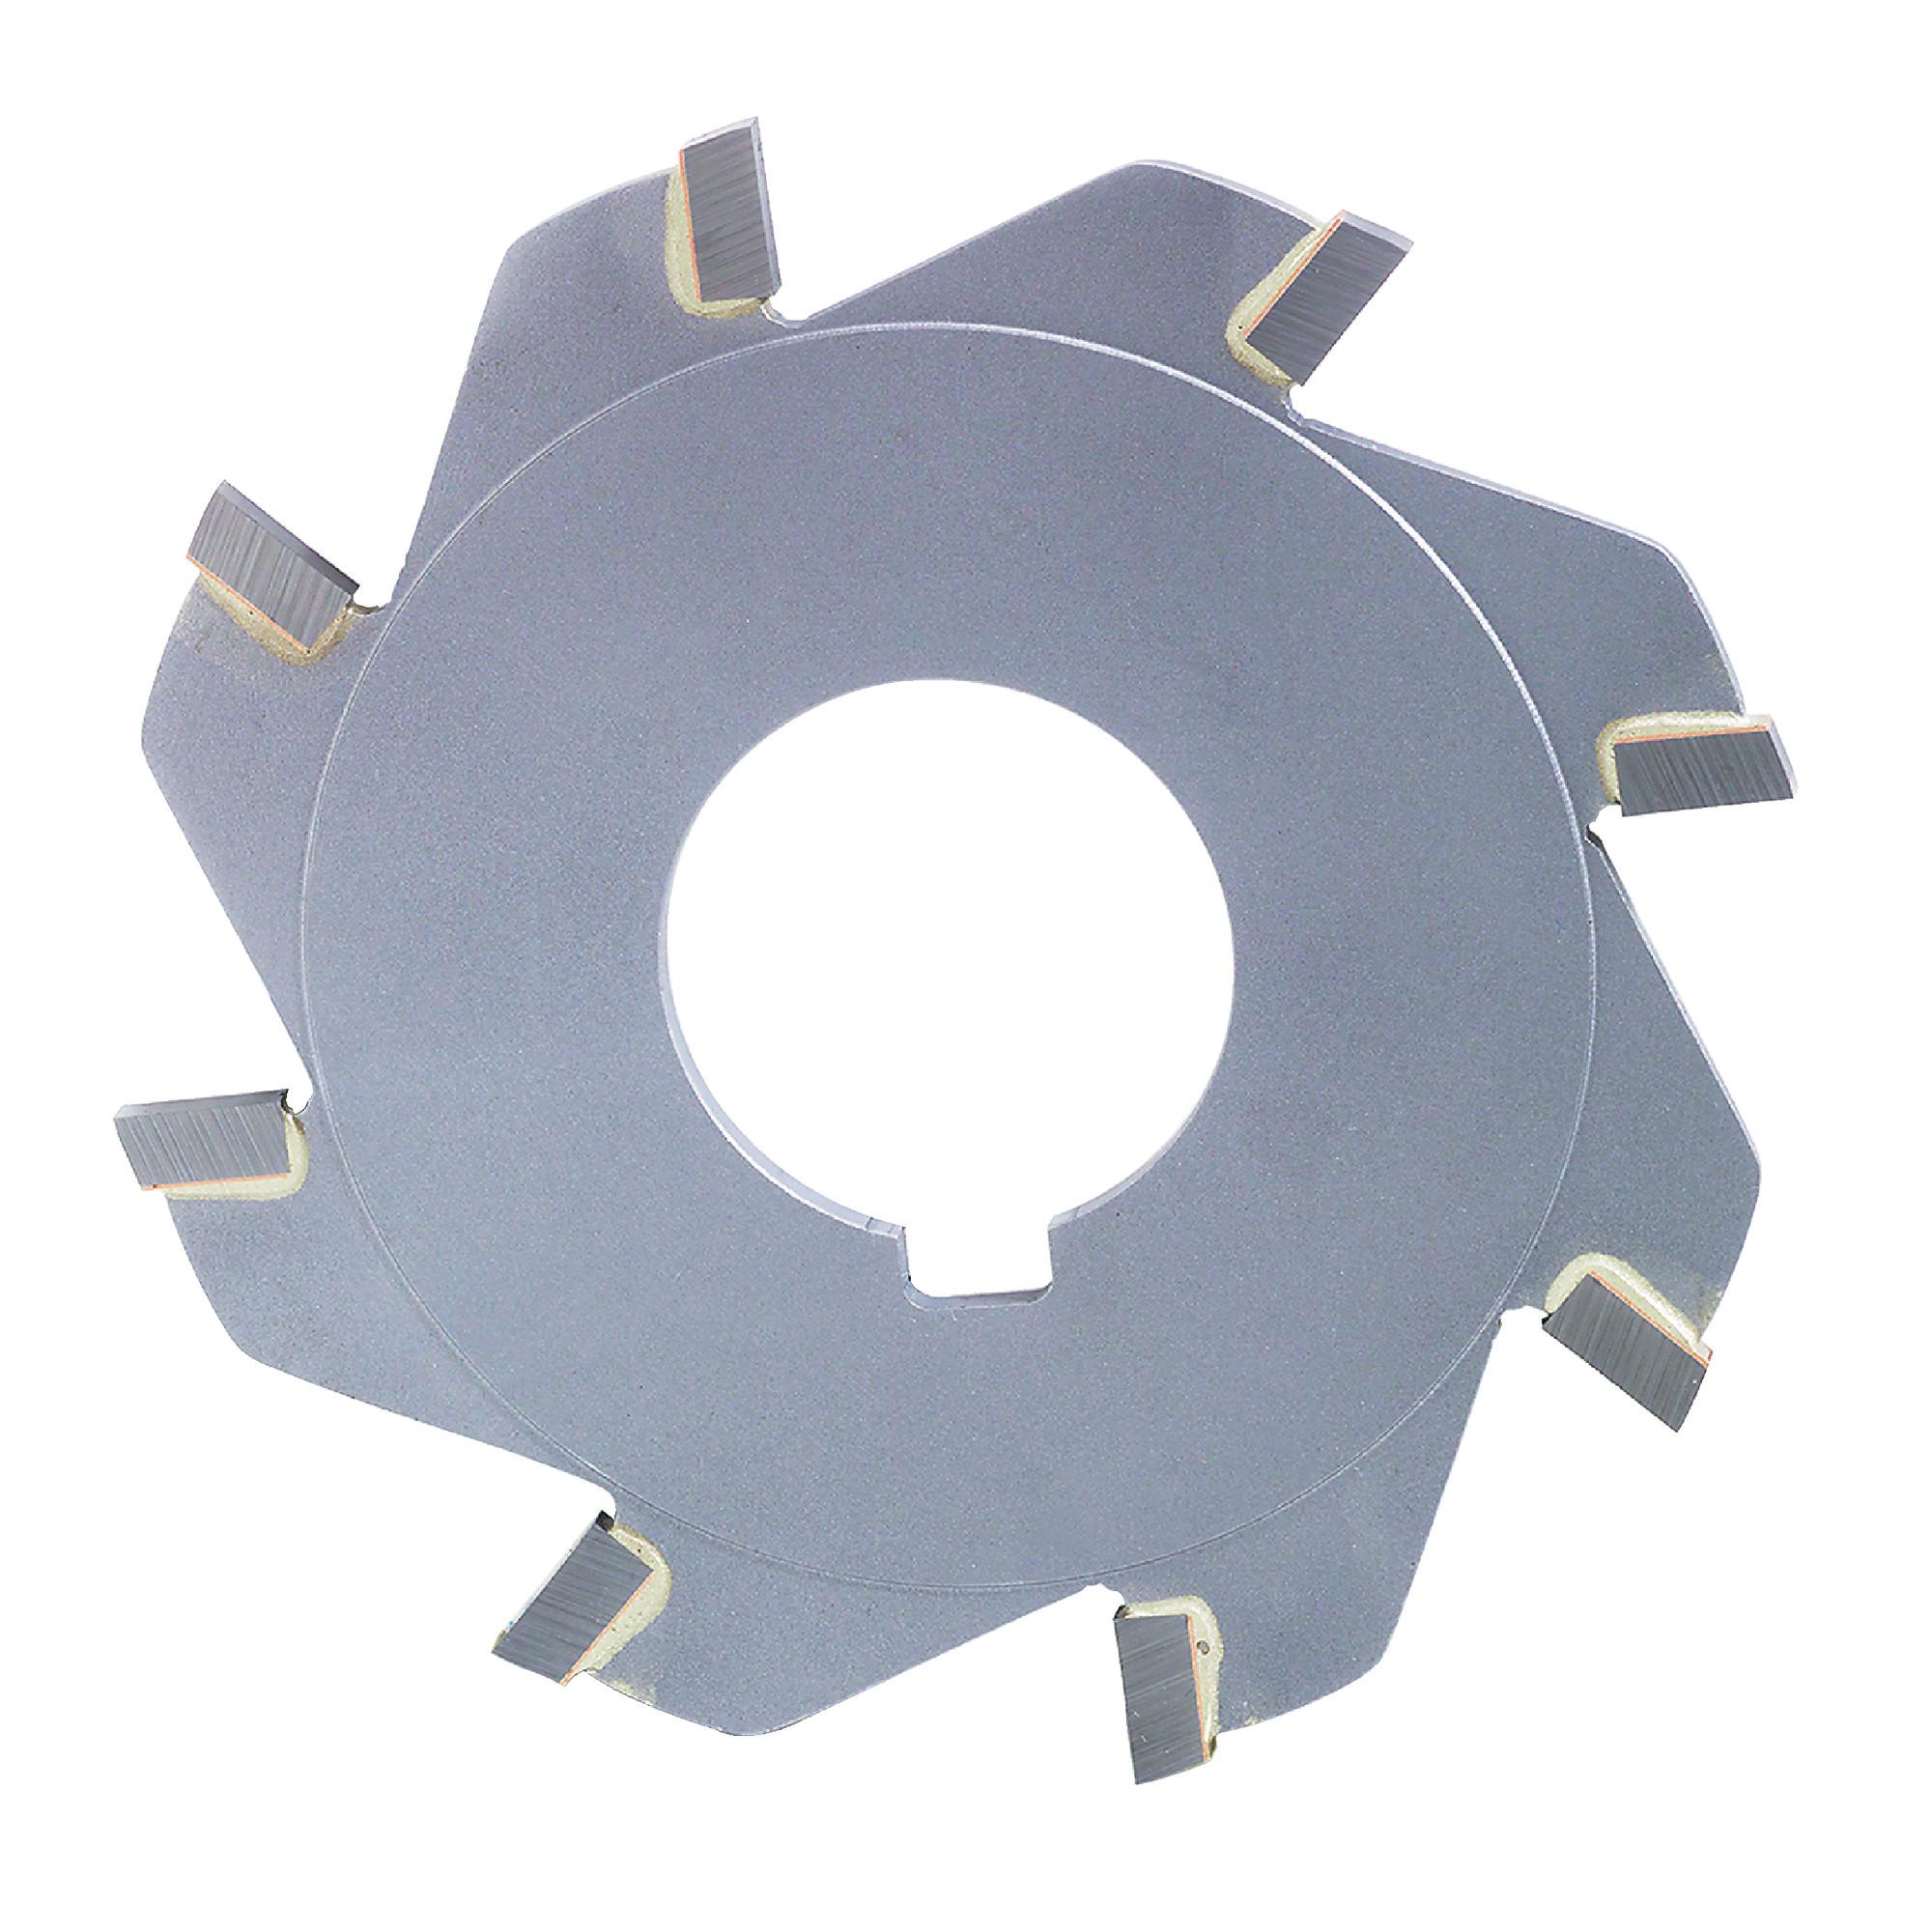 Carbide Tipped Metal Slitting Saw